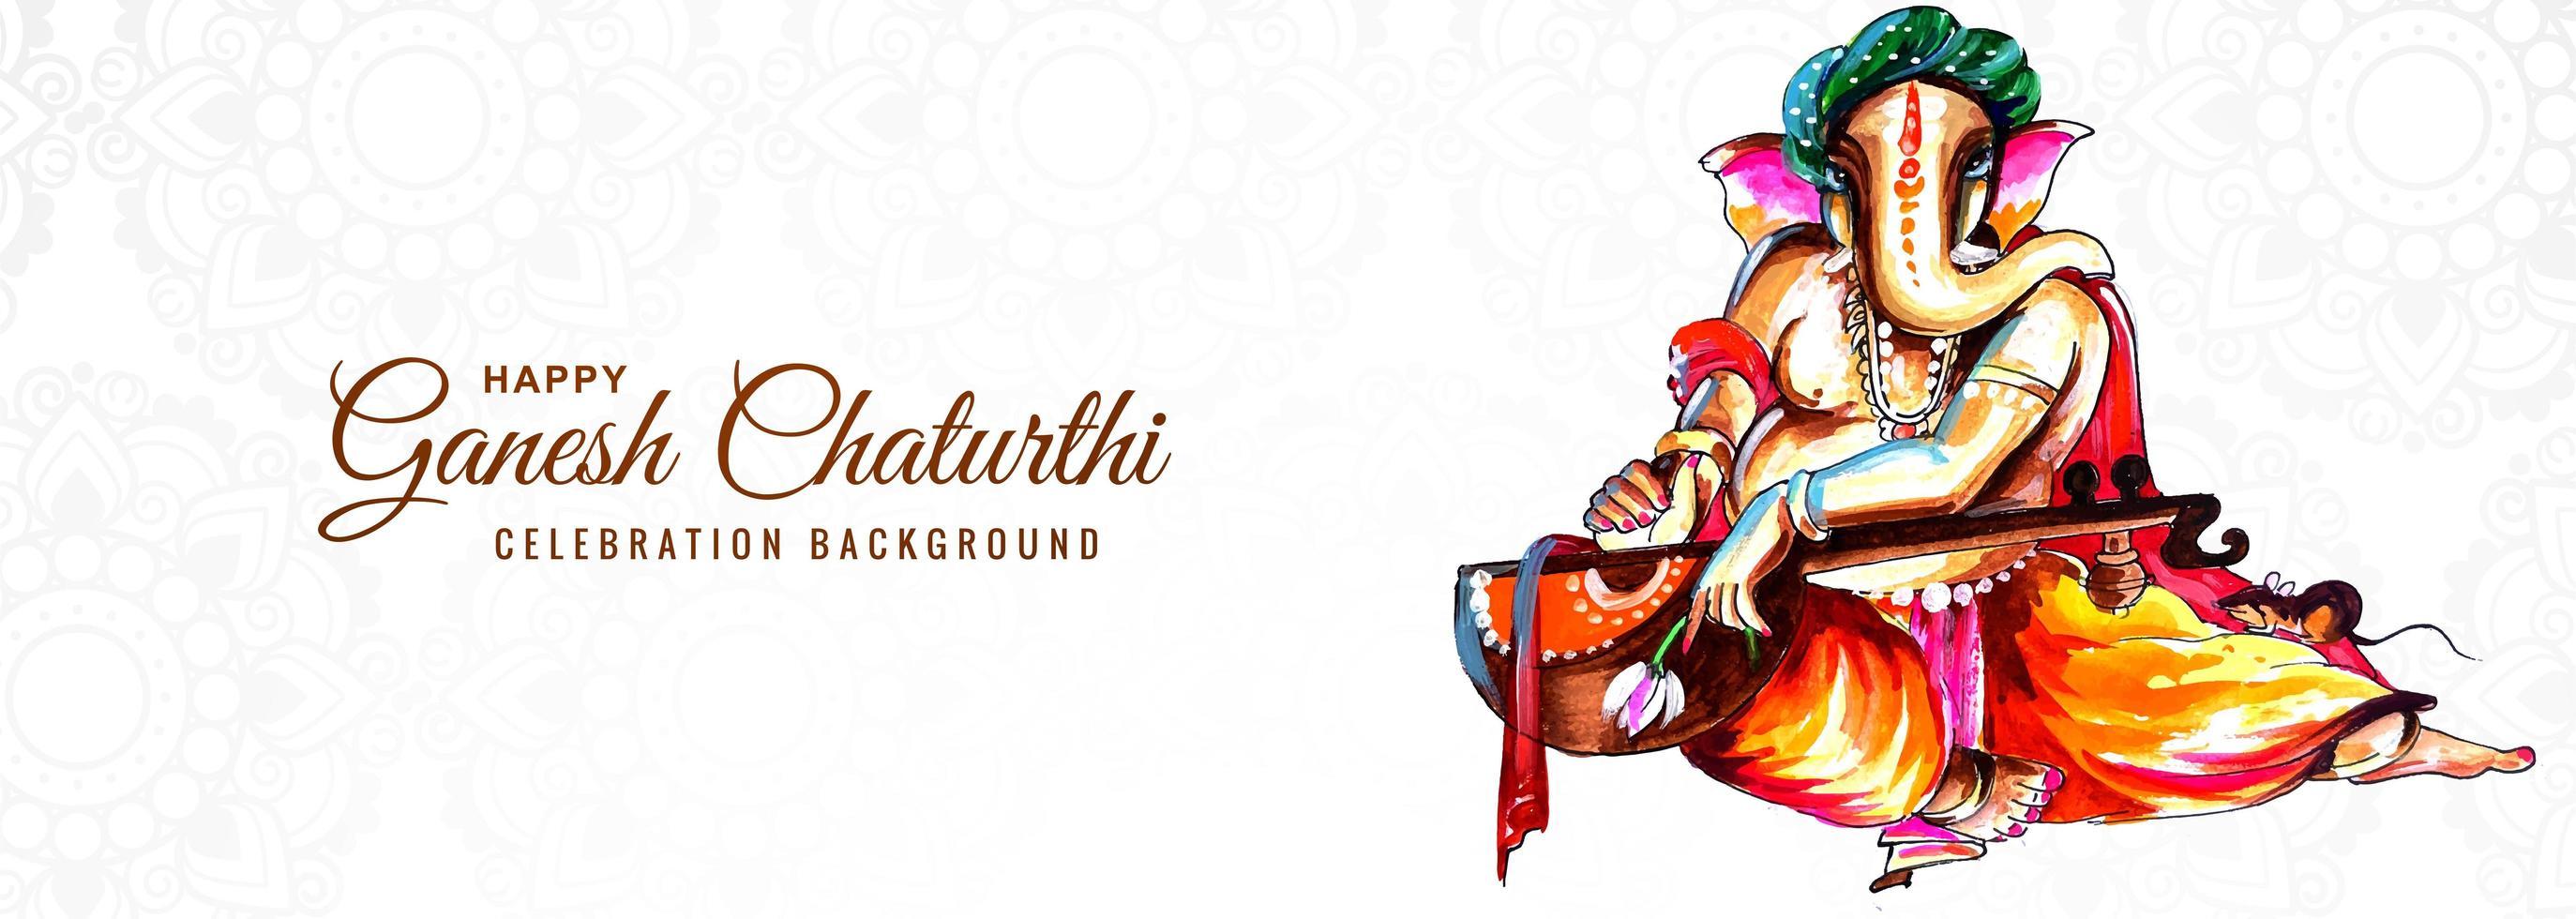 fundo de banner de festival religioso indiano ganesh chaturthi vetor